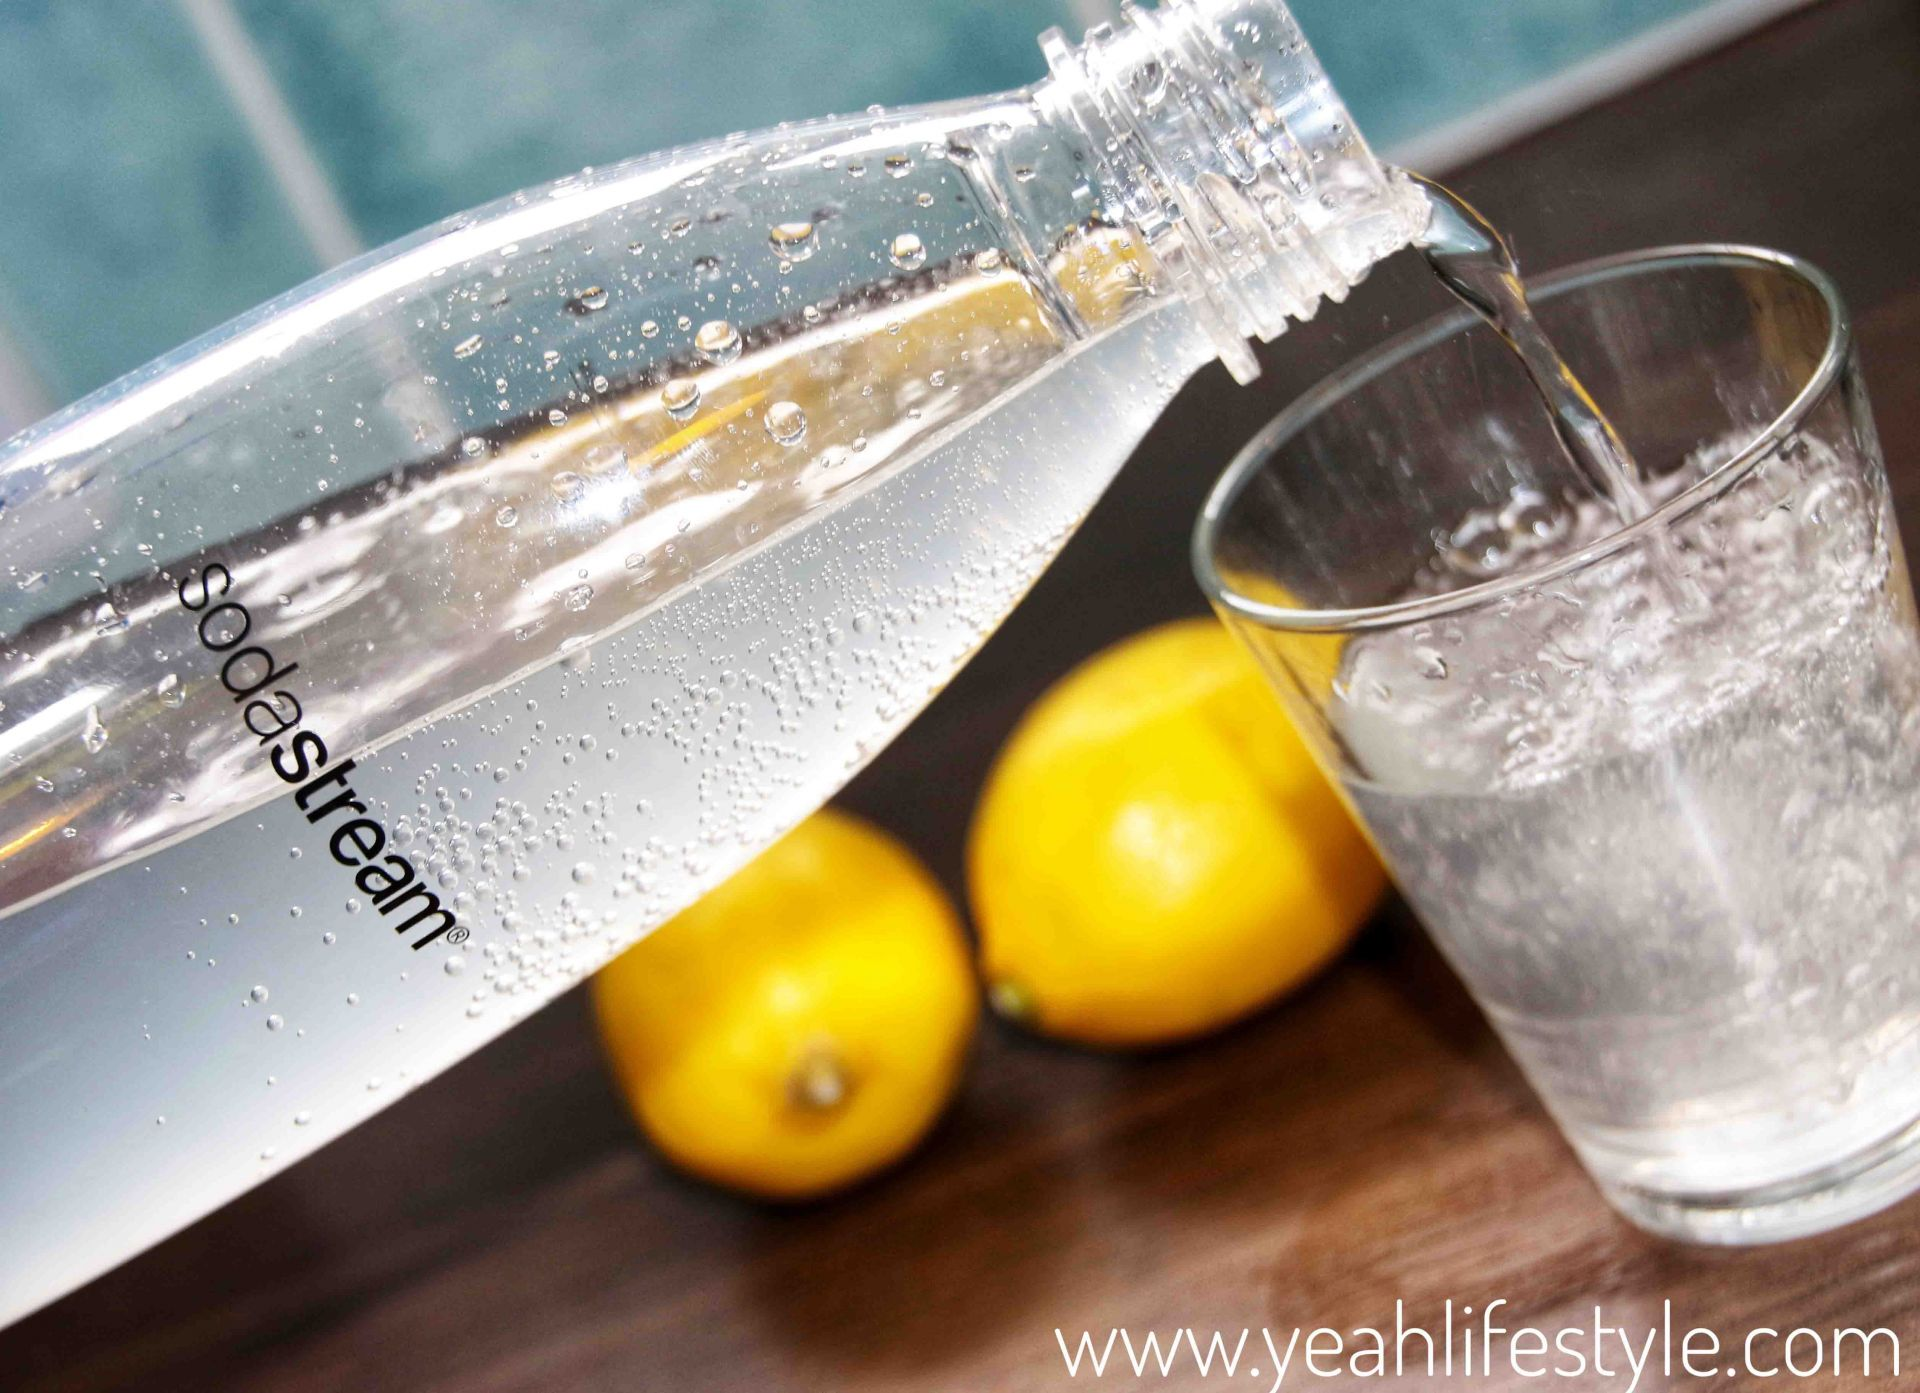 Sodastream Spirit Sparkling Water Maker with Gas Cylinder Megapack